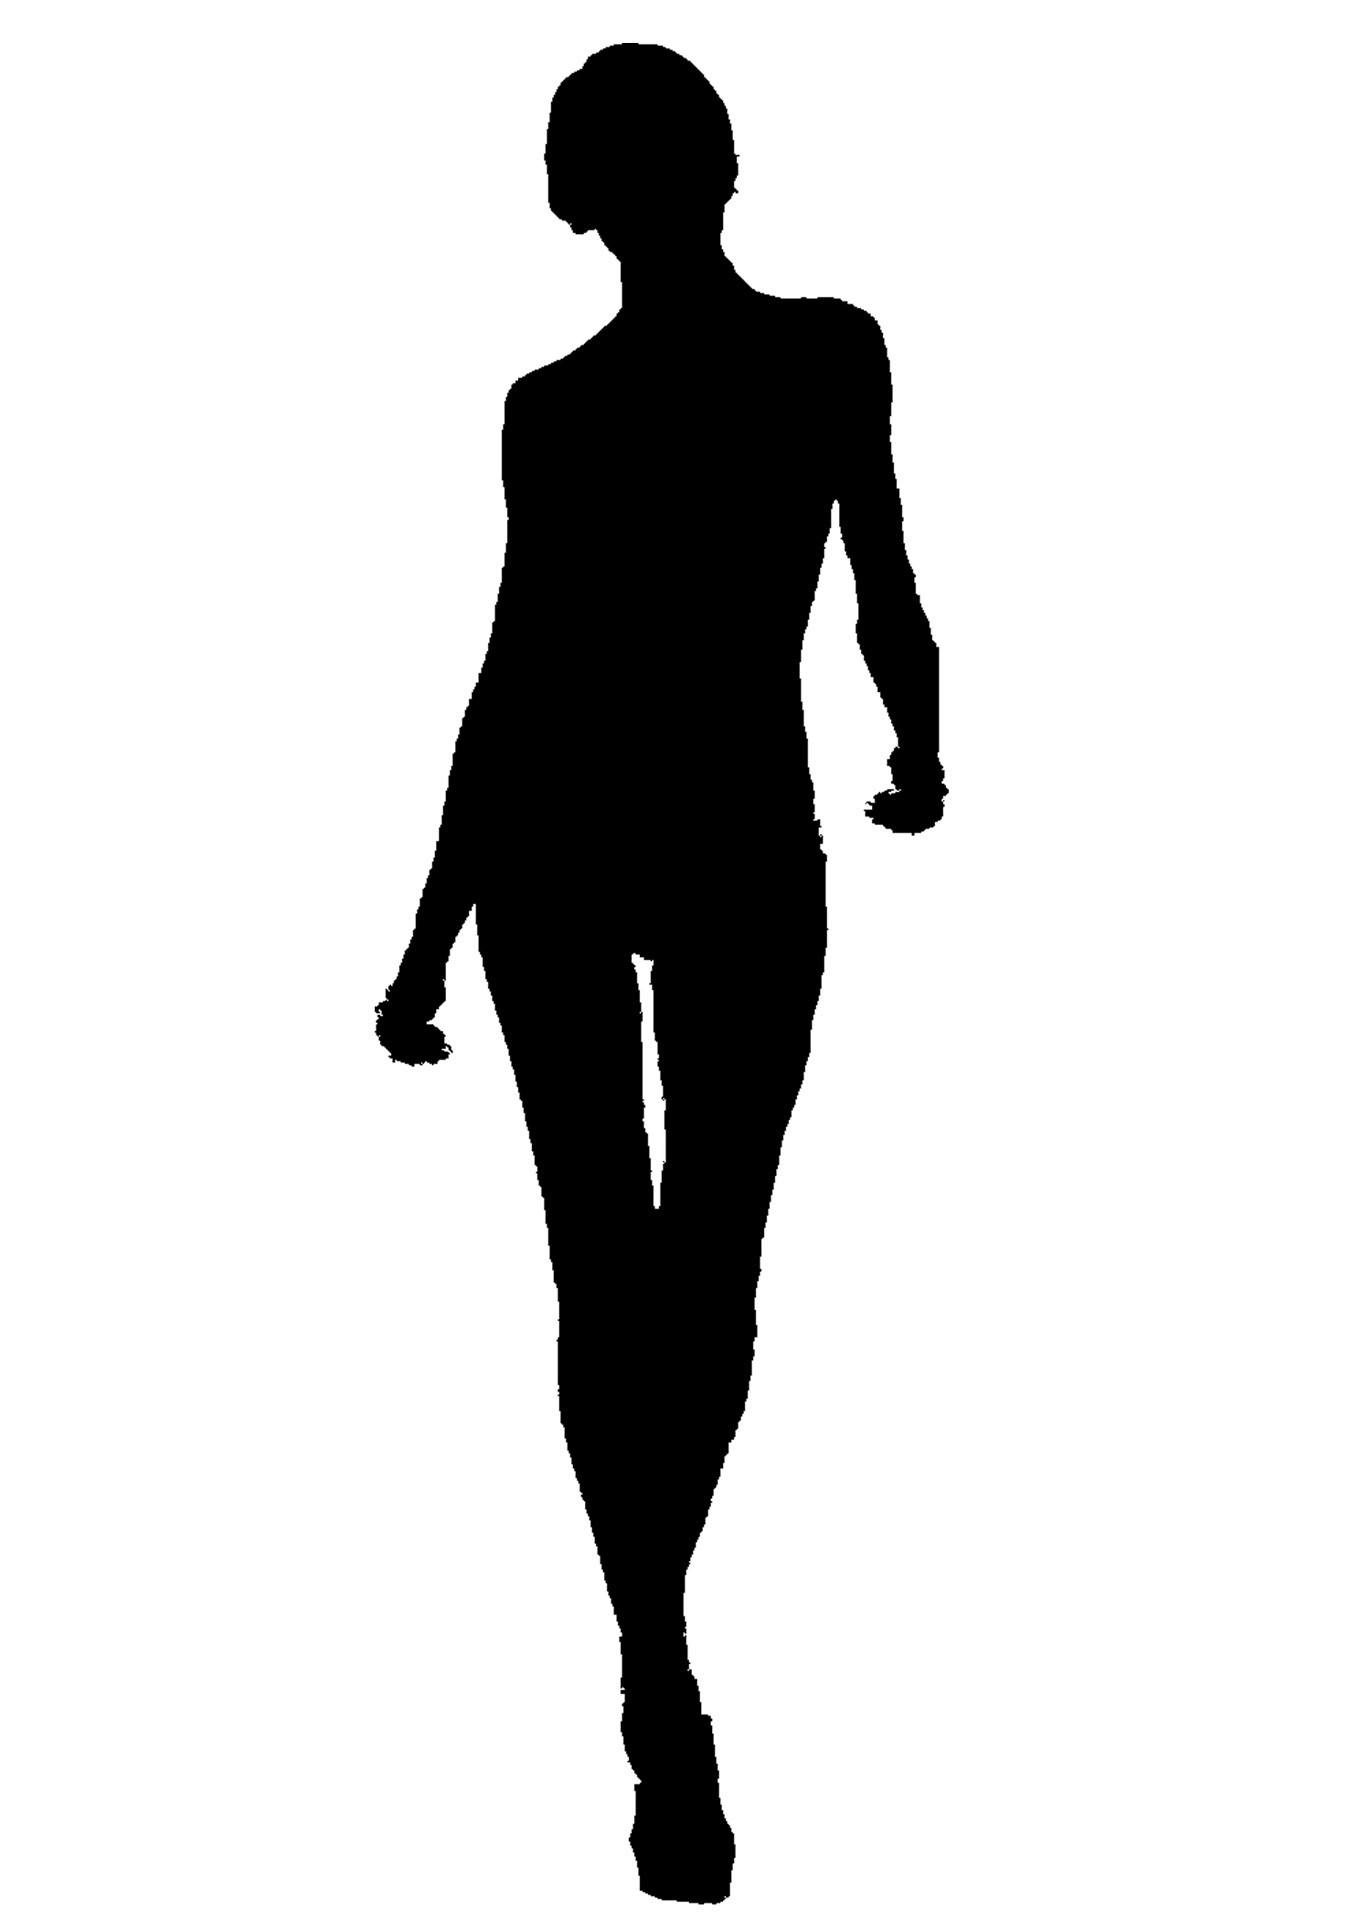 1371x1920 Walking Woman Silhouette Free Stock Photo